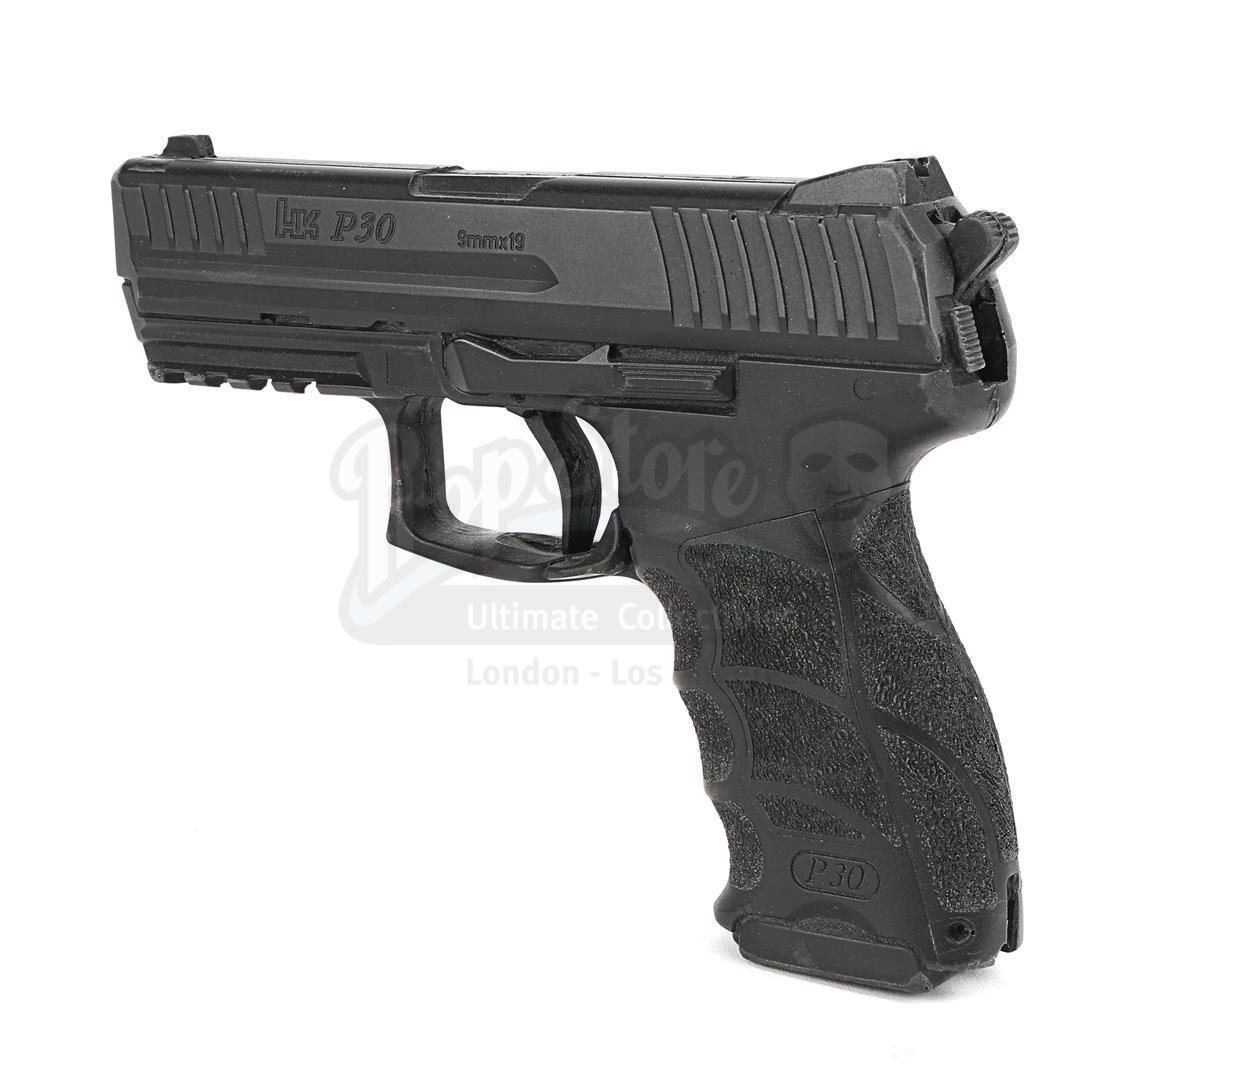 THE AVENGERS (2012) - Hawkeye's (Jeremy Renner) H&K P30 Stunt Pistol - Image 6 of 10